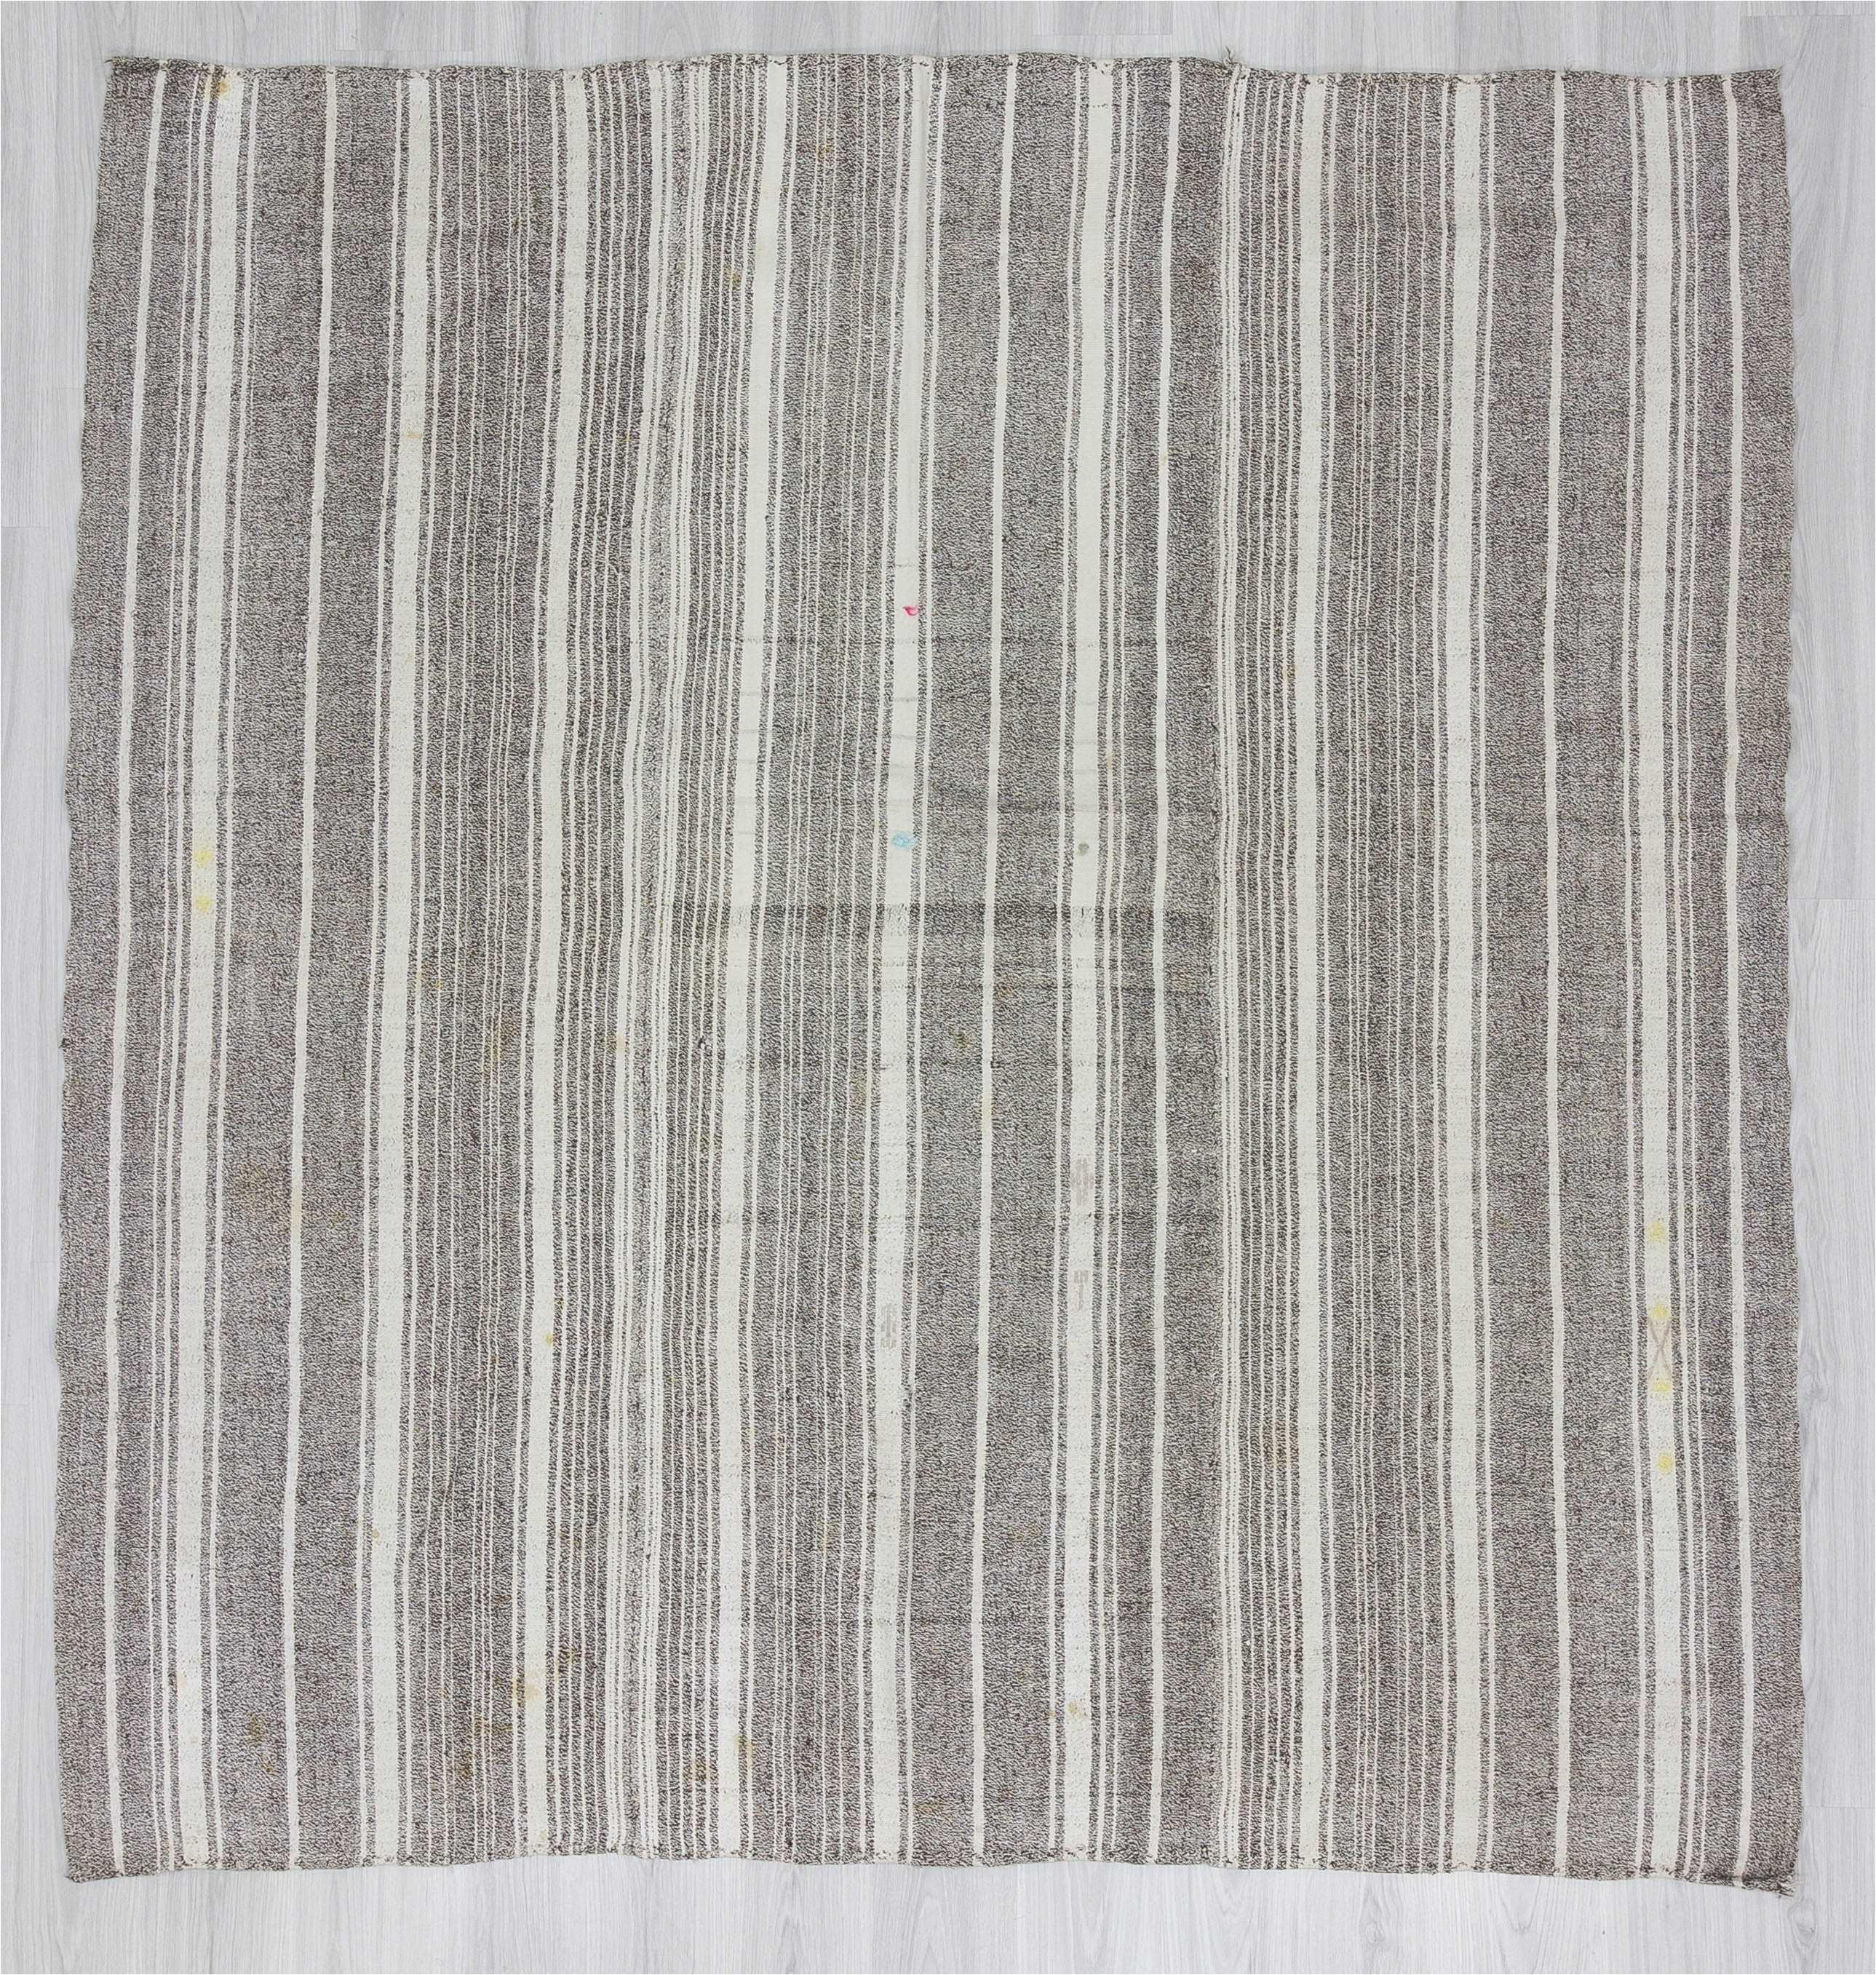 1216 white gray striped vintage modern turkish kilim